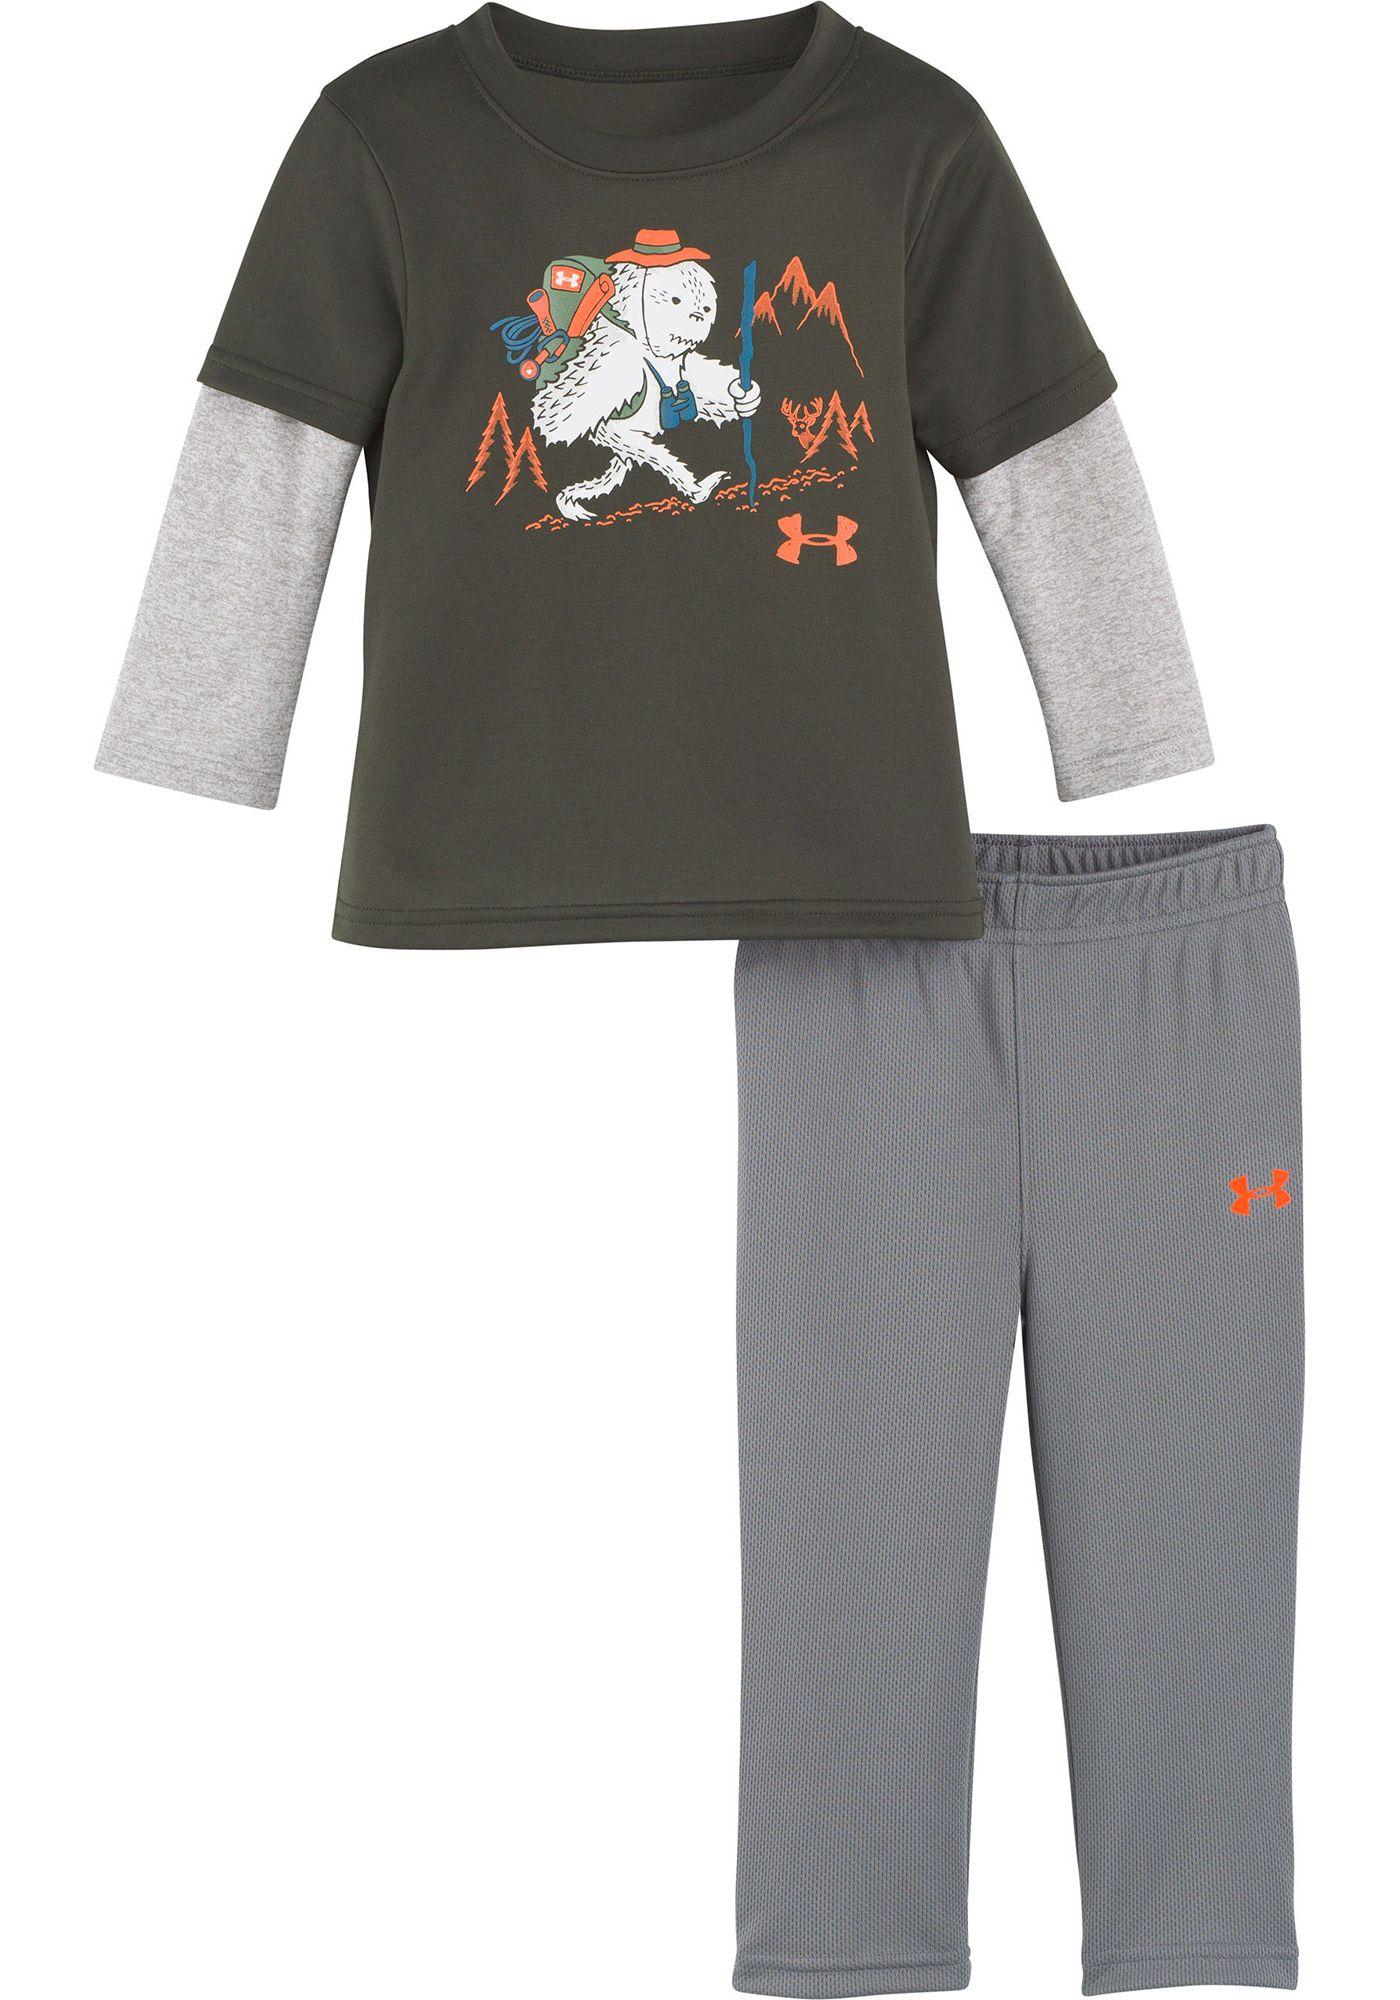 Under Armour Infant Boys' Yeti Hiker Long Sleeve Shirt and Pant Set